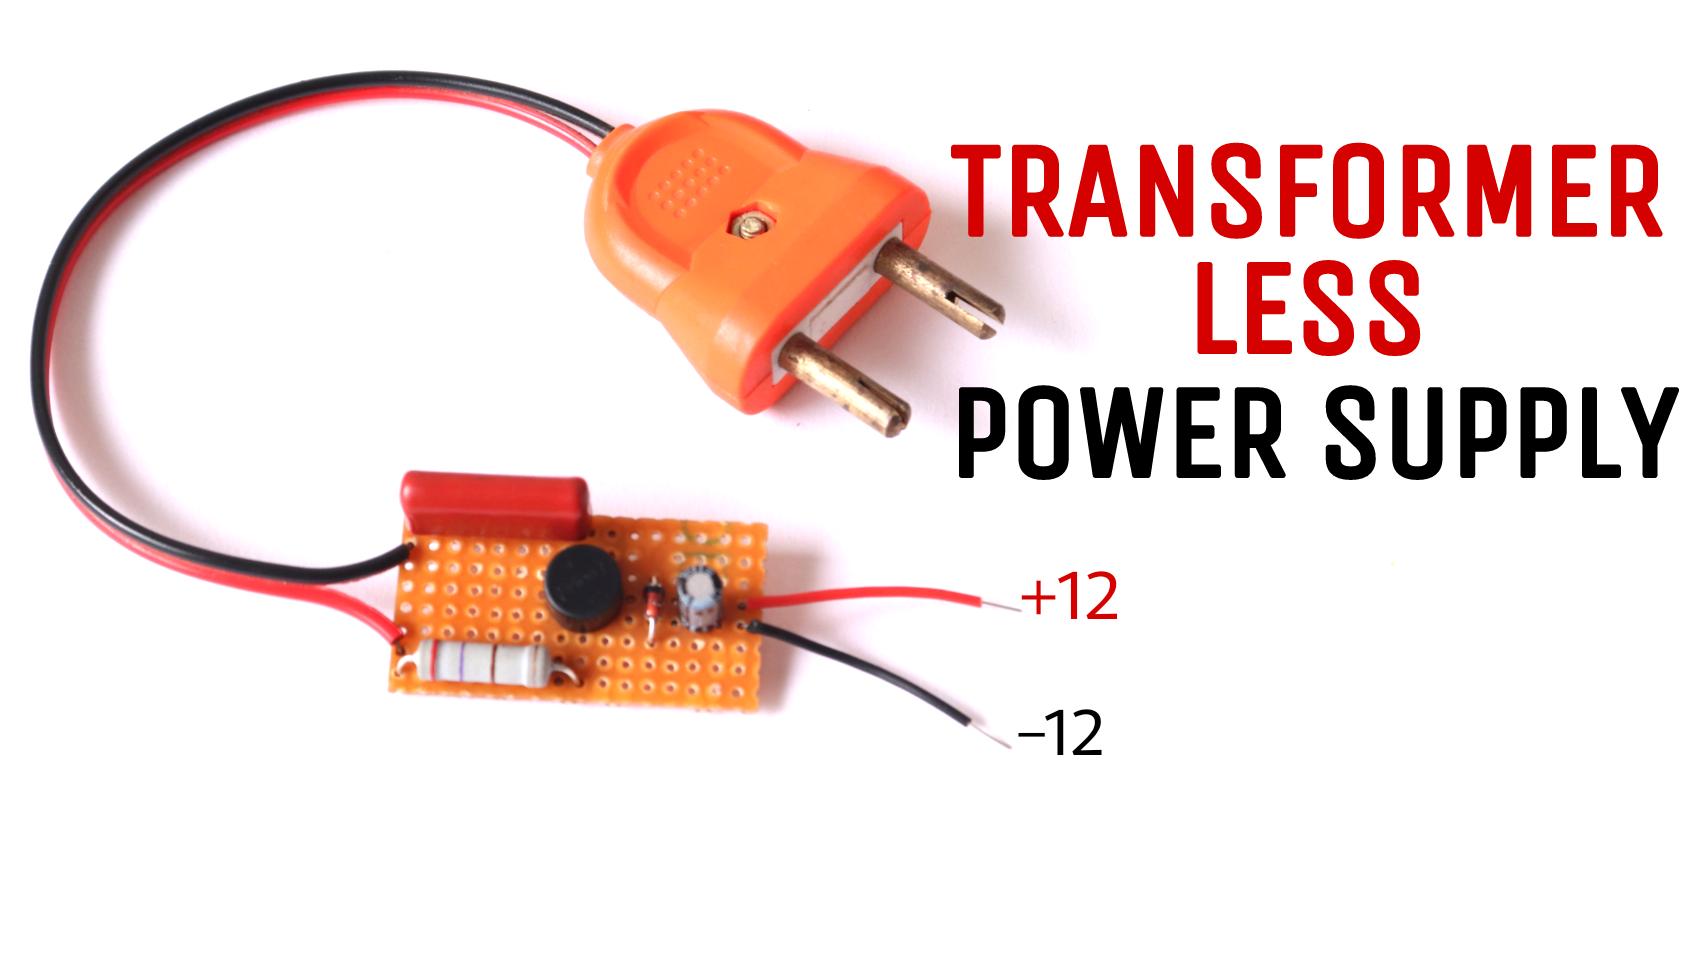 Pleasing Transformer Less Power Supply 12V 100Ma Electronics Task Wiring Cloud Overrenstrafr09Org